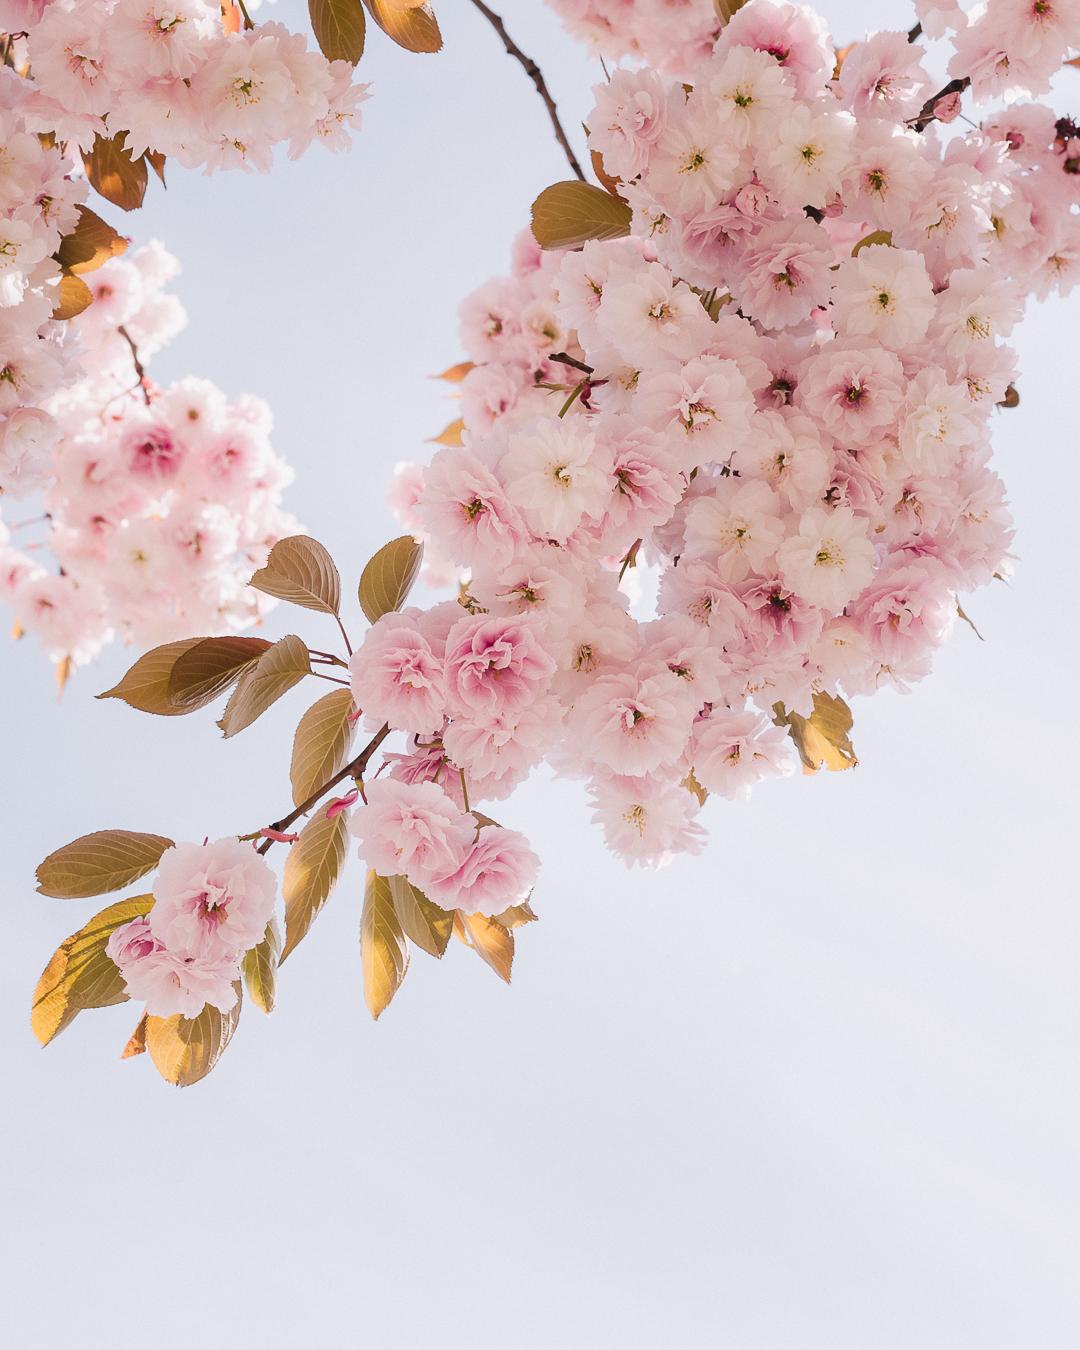 Prunus serrulata  'Shirofugen', photographed on the 27th of April, 2018 at Vancouver General Hospital.